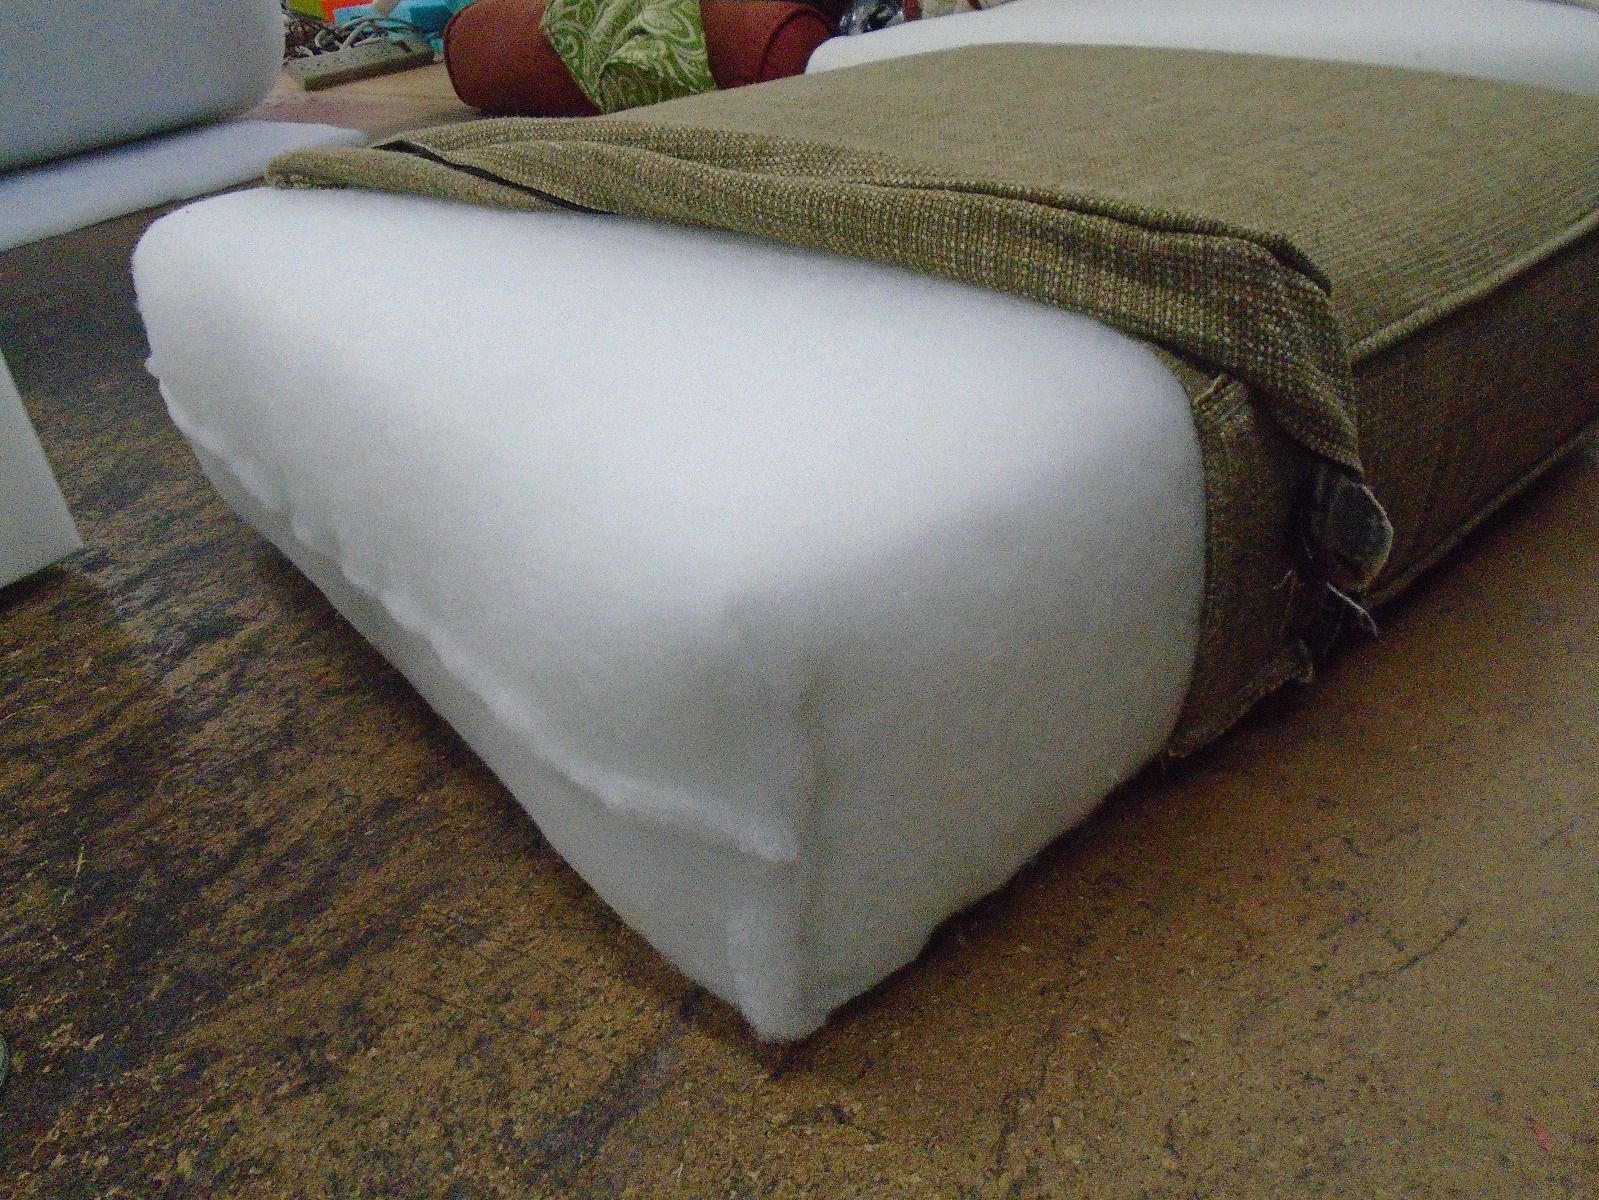 Foam Cushion With Dacron Wrap Foam Cushion Replacement Cushions